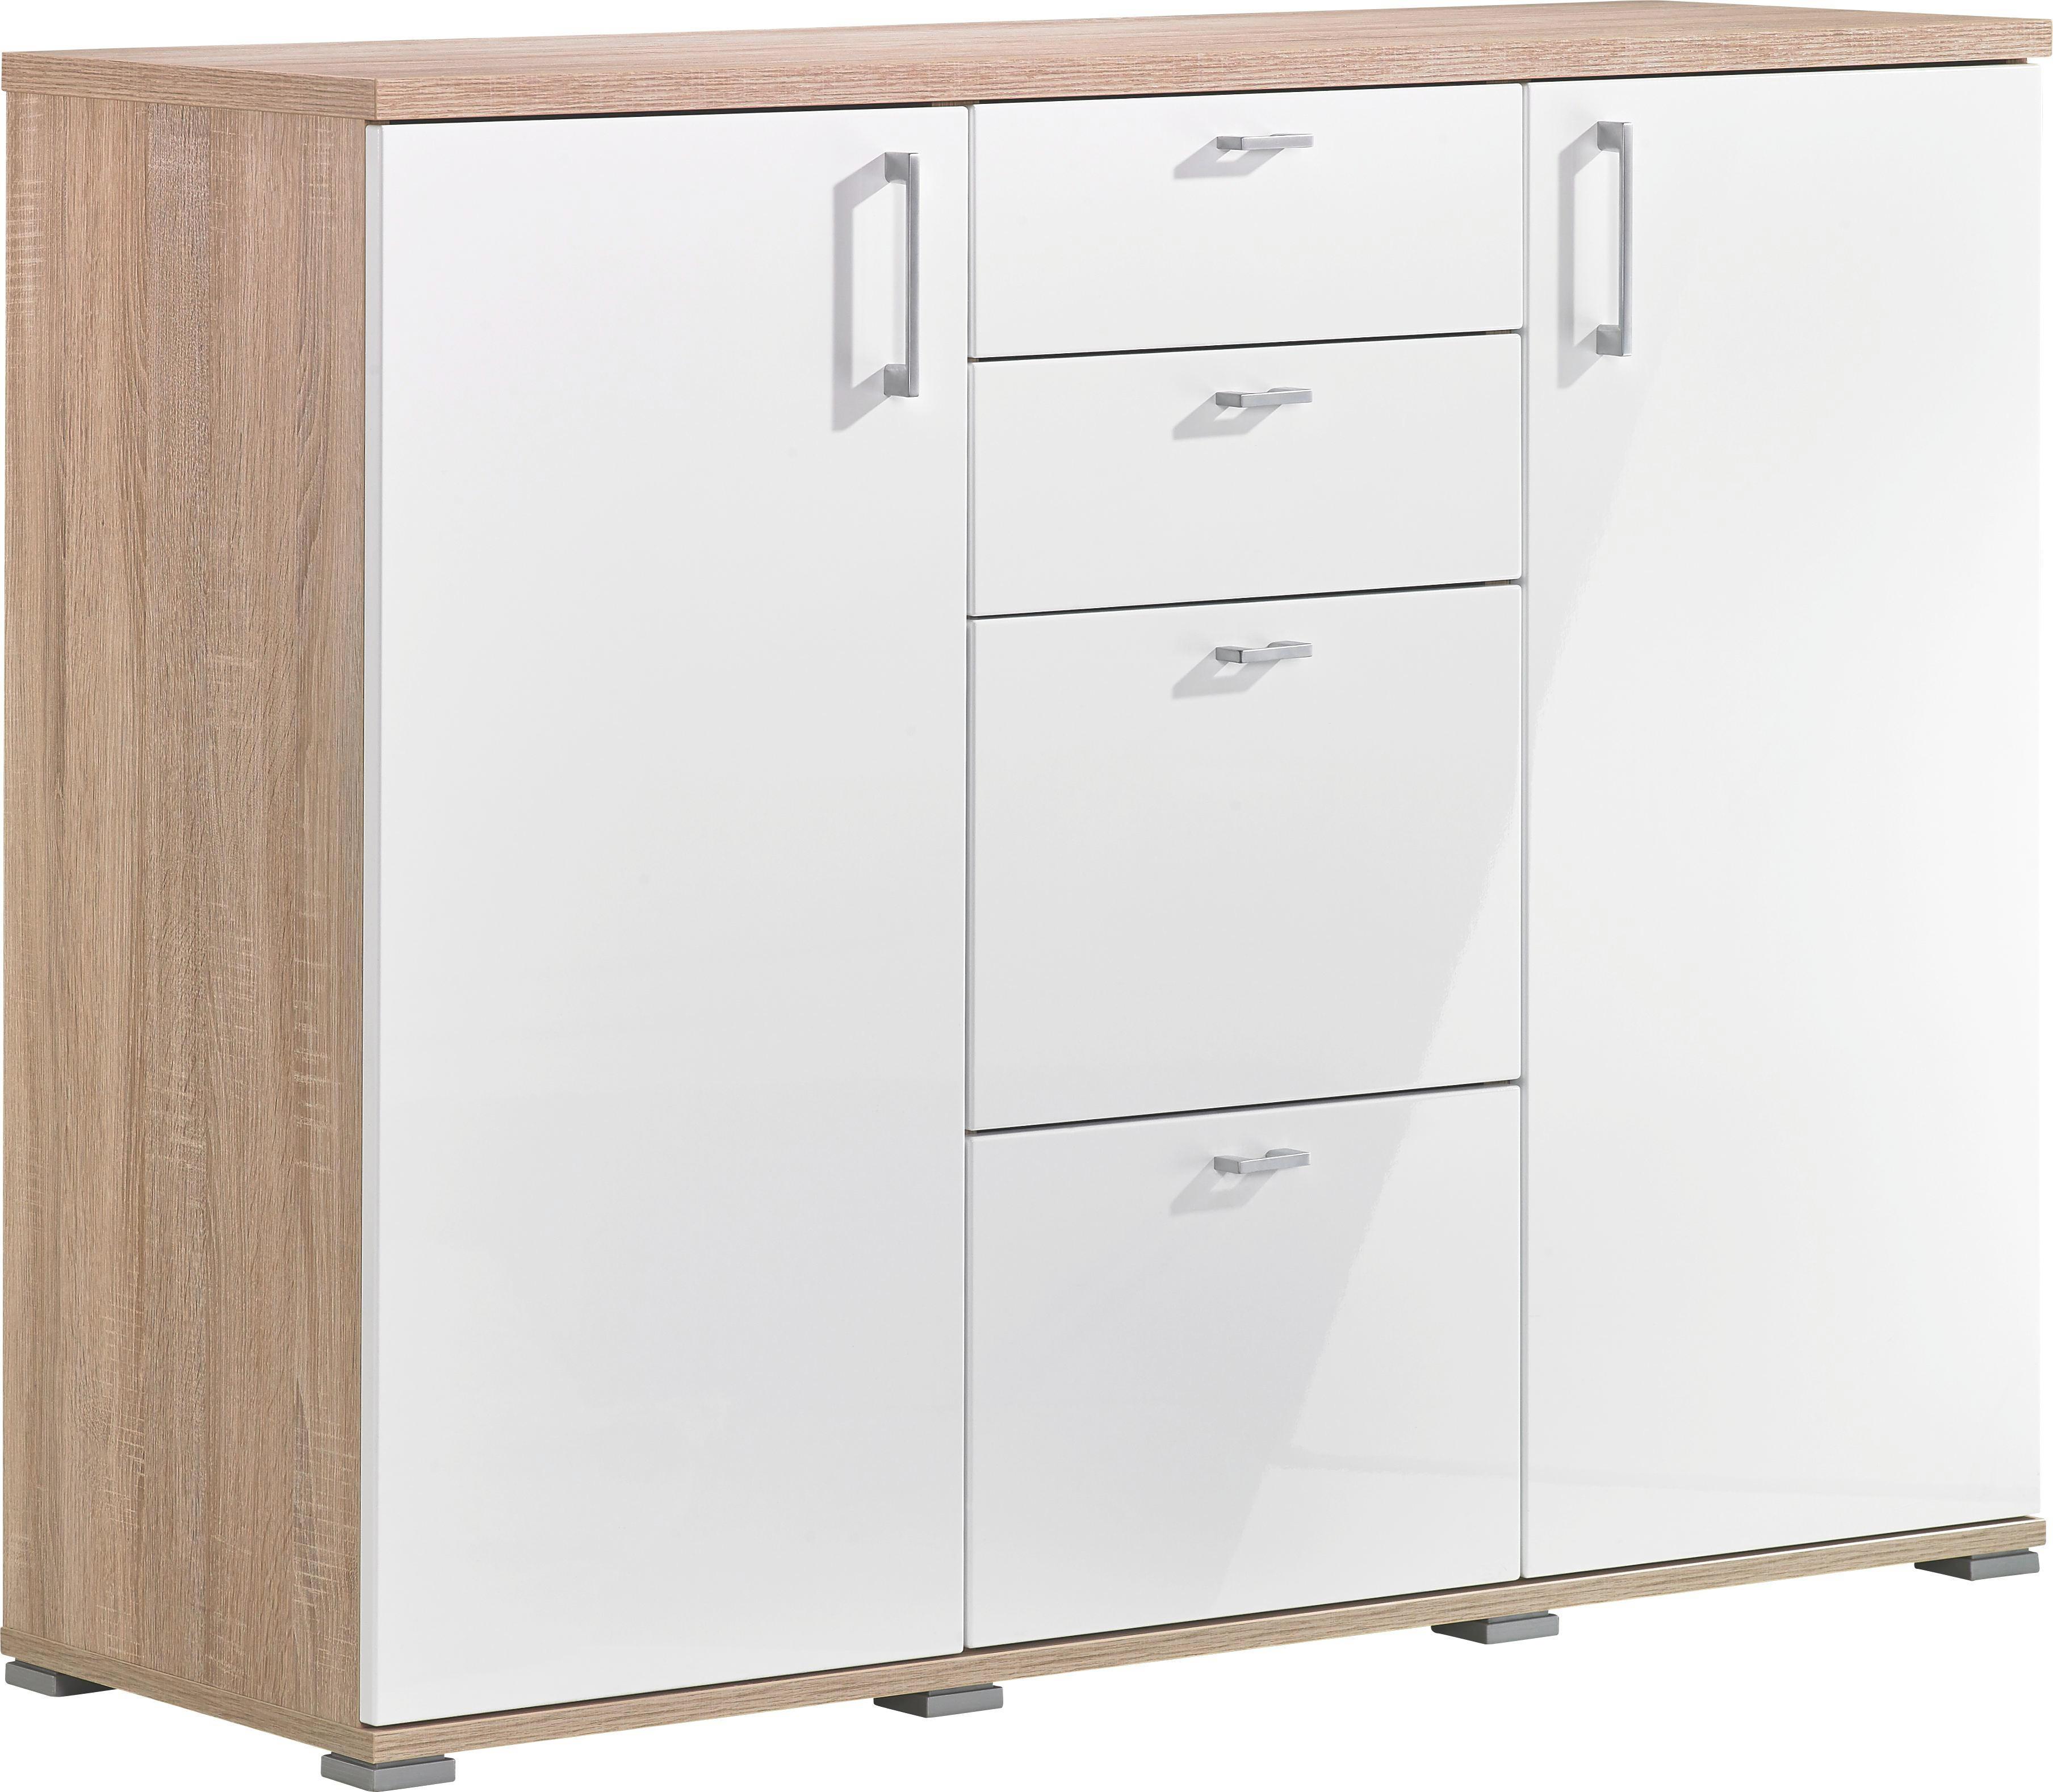 Kommode Eichefarben Silberfarben Design Holzwerkstoff Kunststoff Cs Schmal?upscaleu003dpaddu0026wu003d520u0026hu003d470u0026qltu003d90